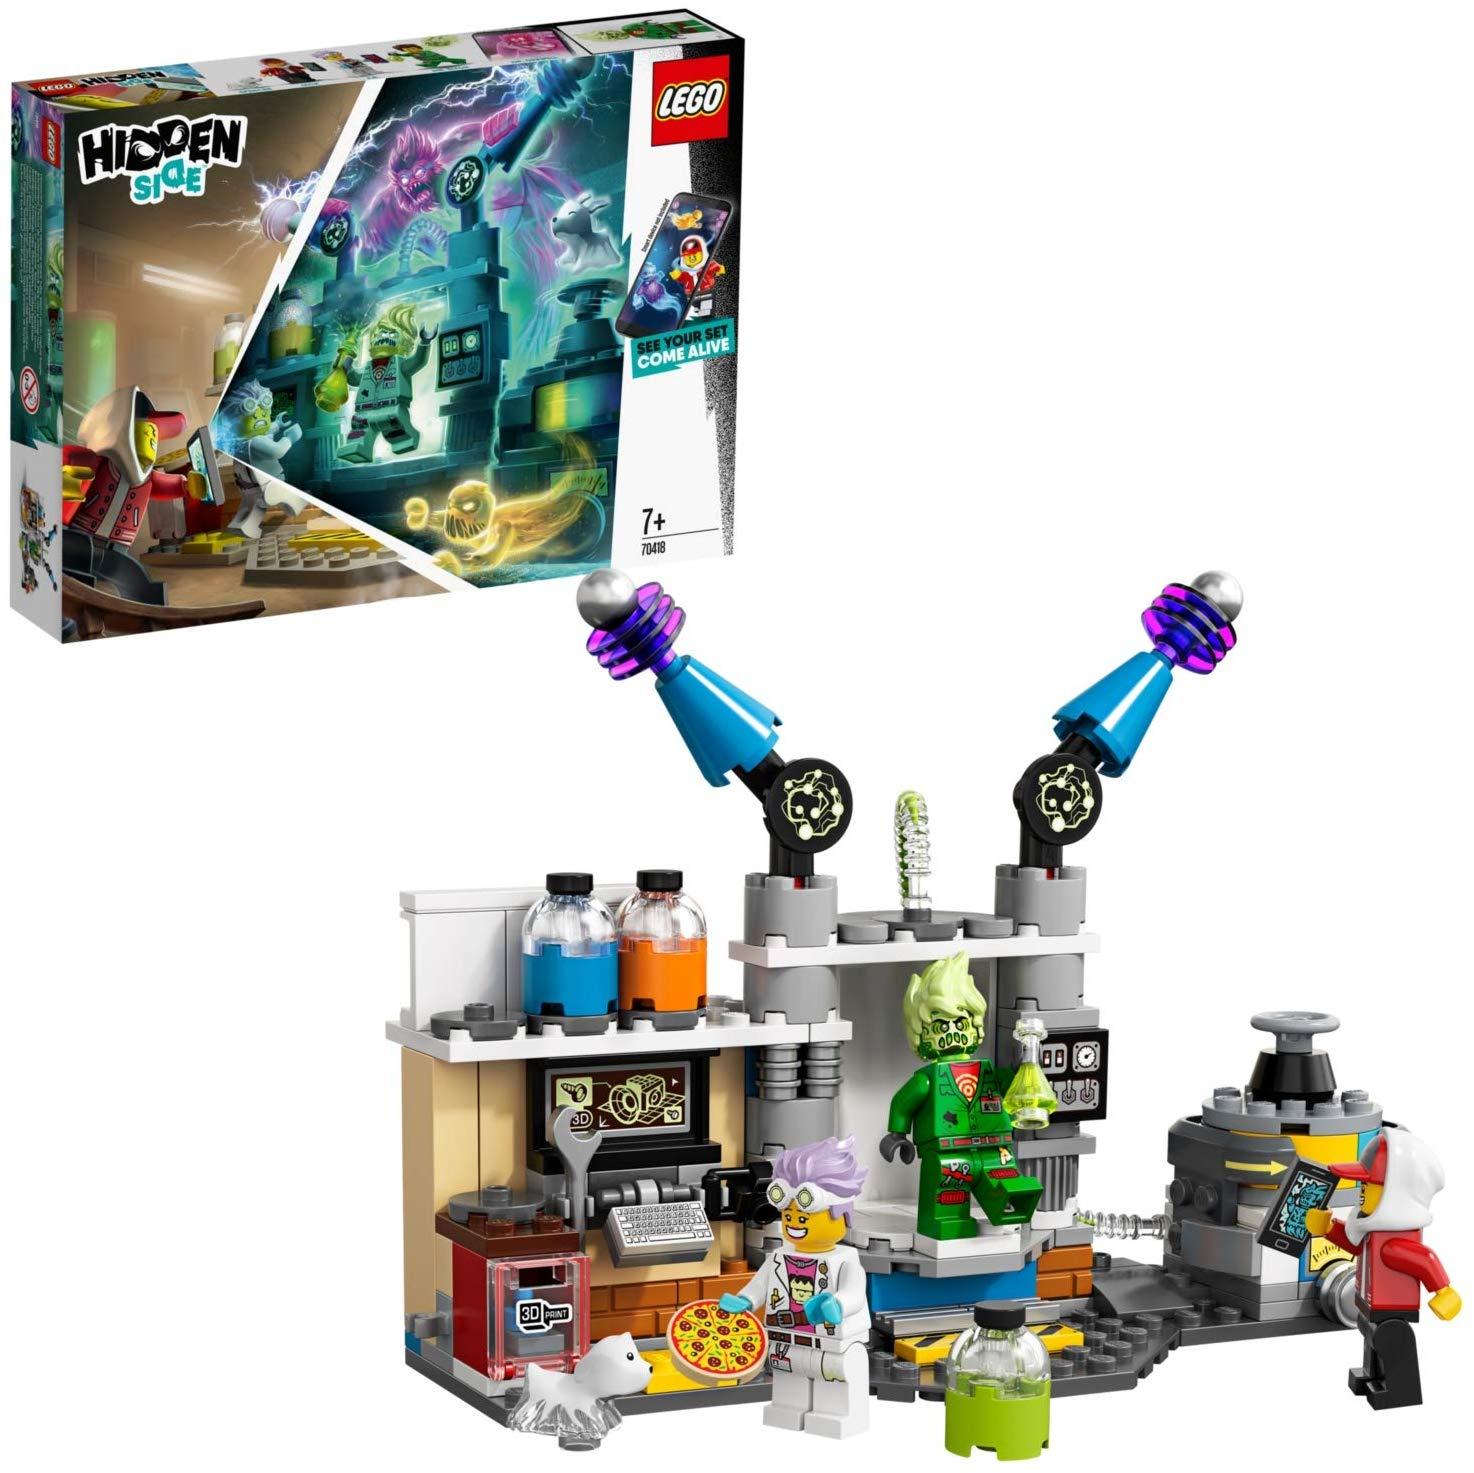 LEGO 70418 Hidden Side J.B.'s Ghost Lab Set, AR Games App £13.50 + £4.49 NP @ Amazon